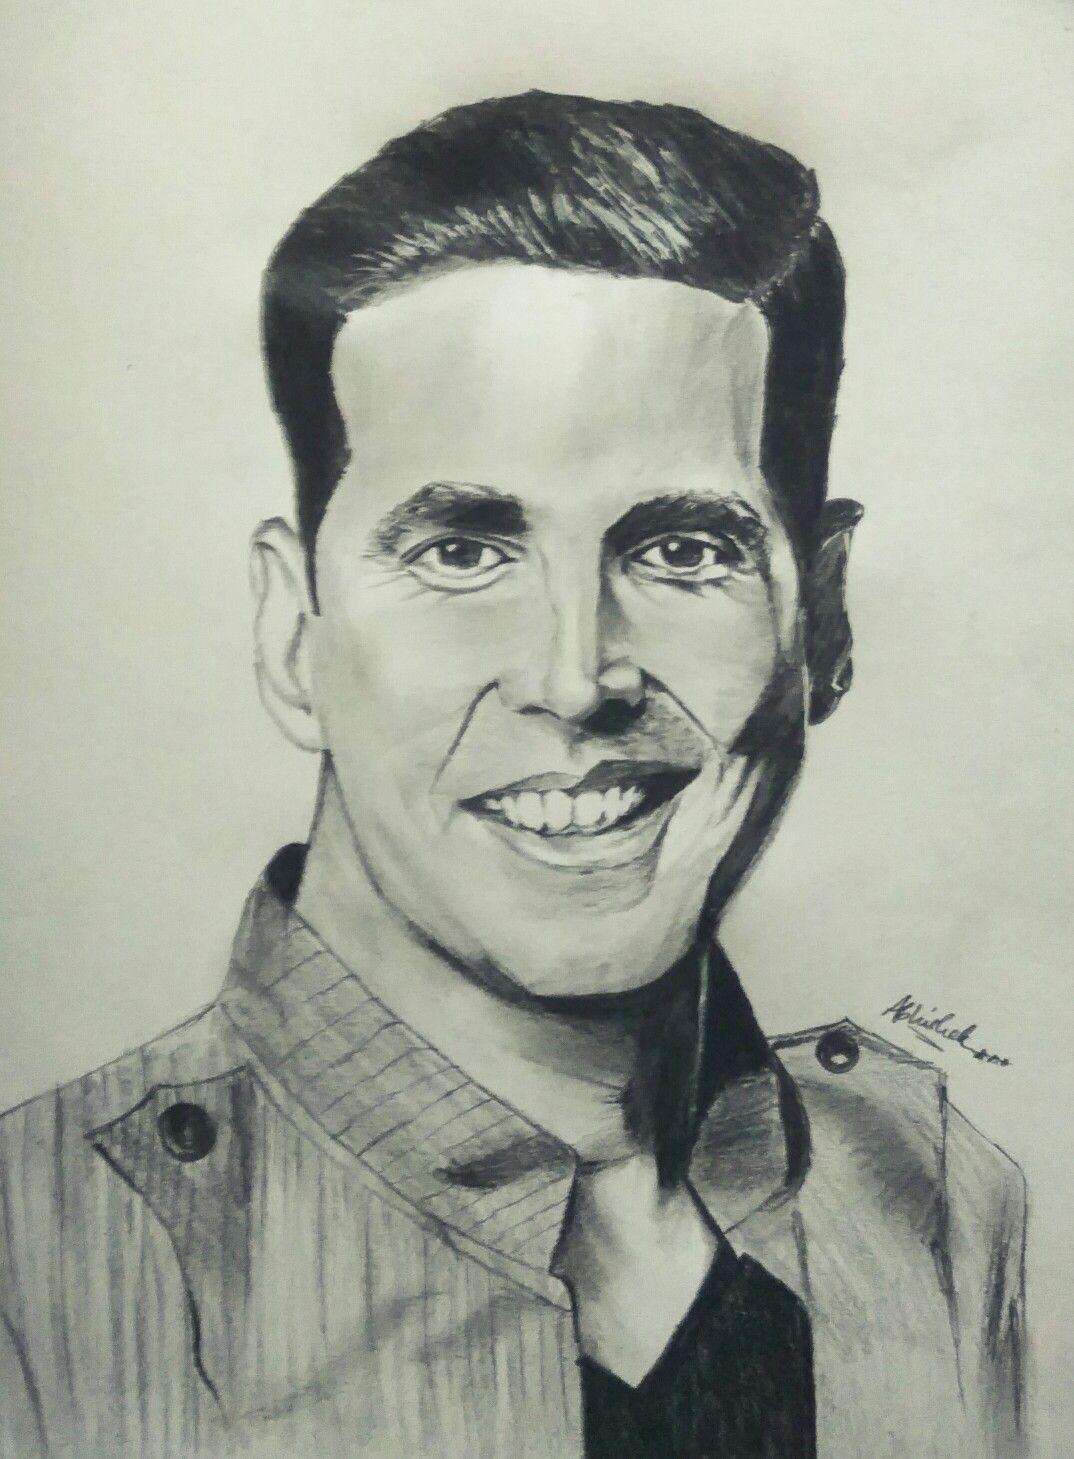 Akshay kumar versatile actor celebrity caricatures celebrity portraits face sketch hint